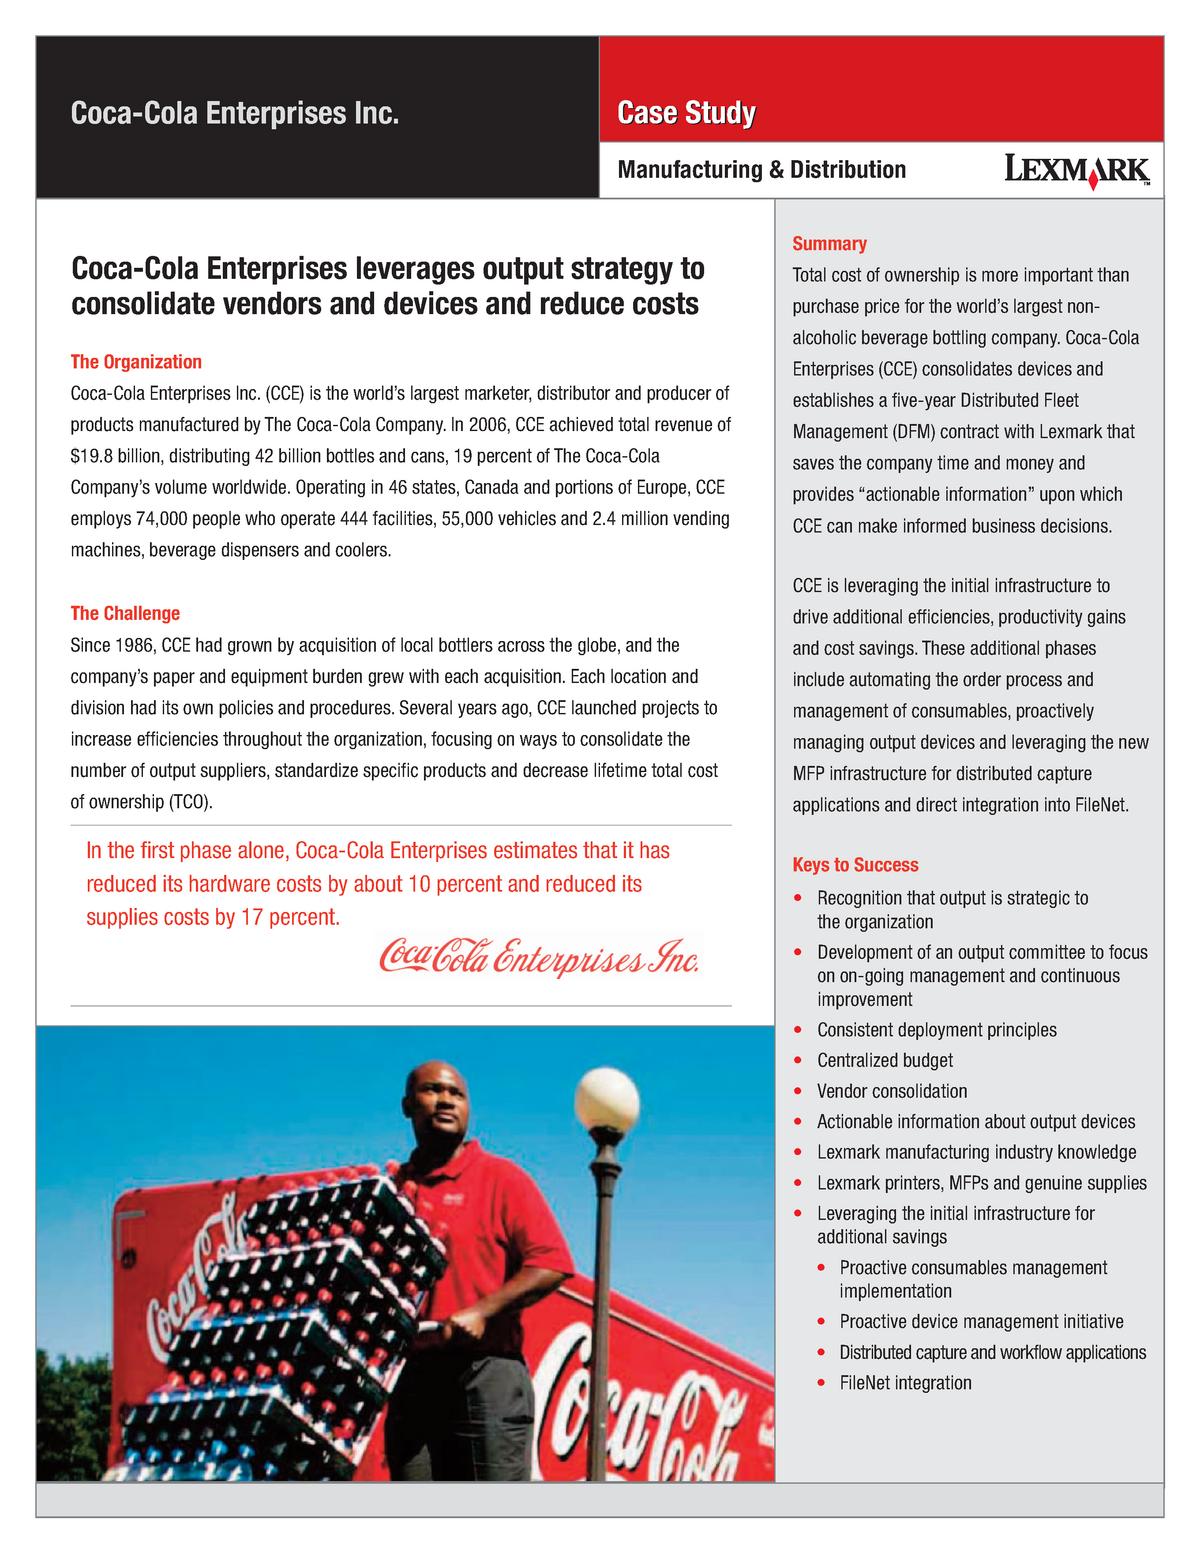 Coke case study - Accounting & Finance - StuDocu